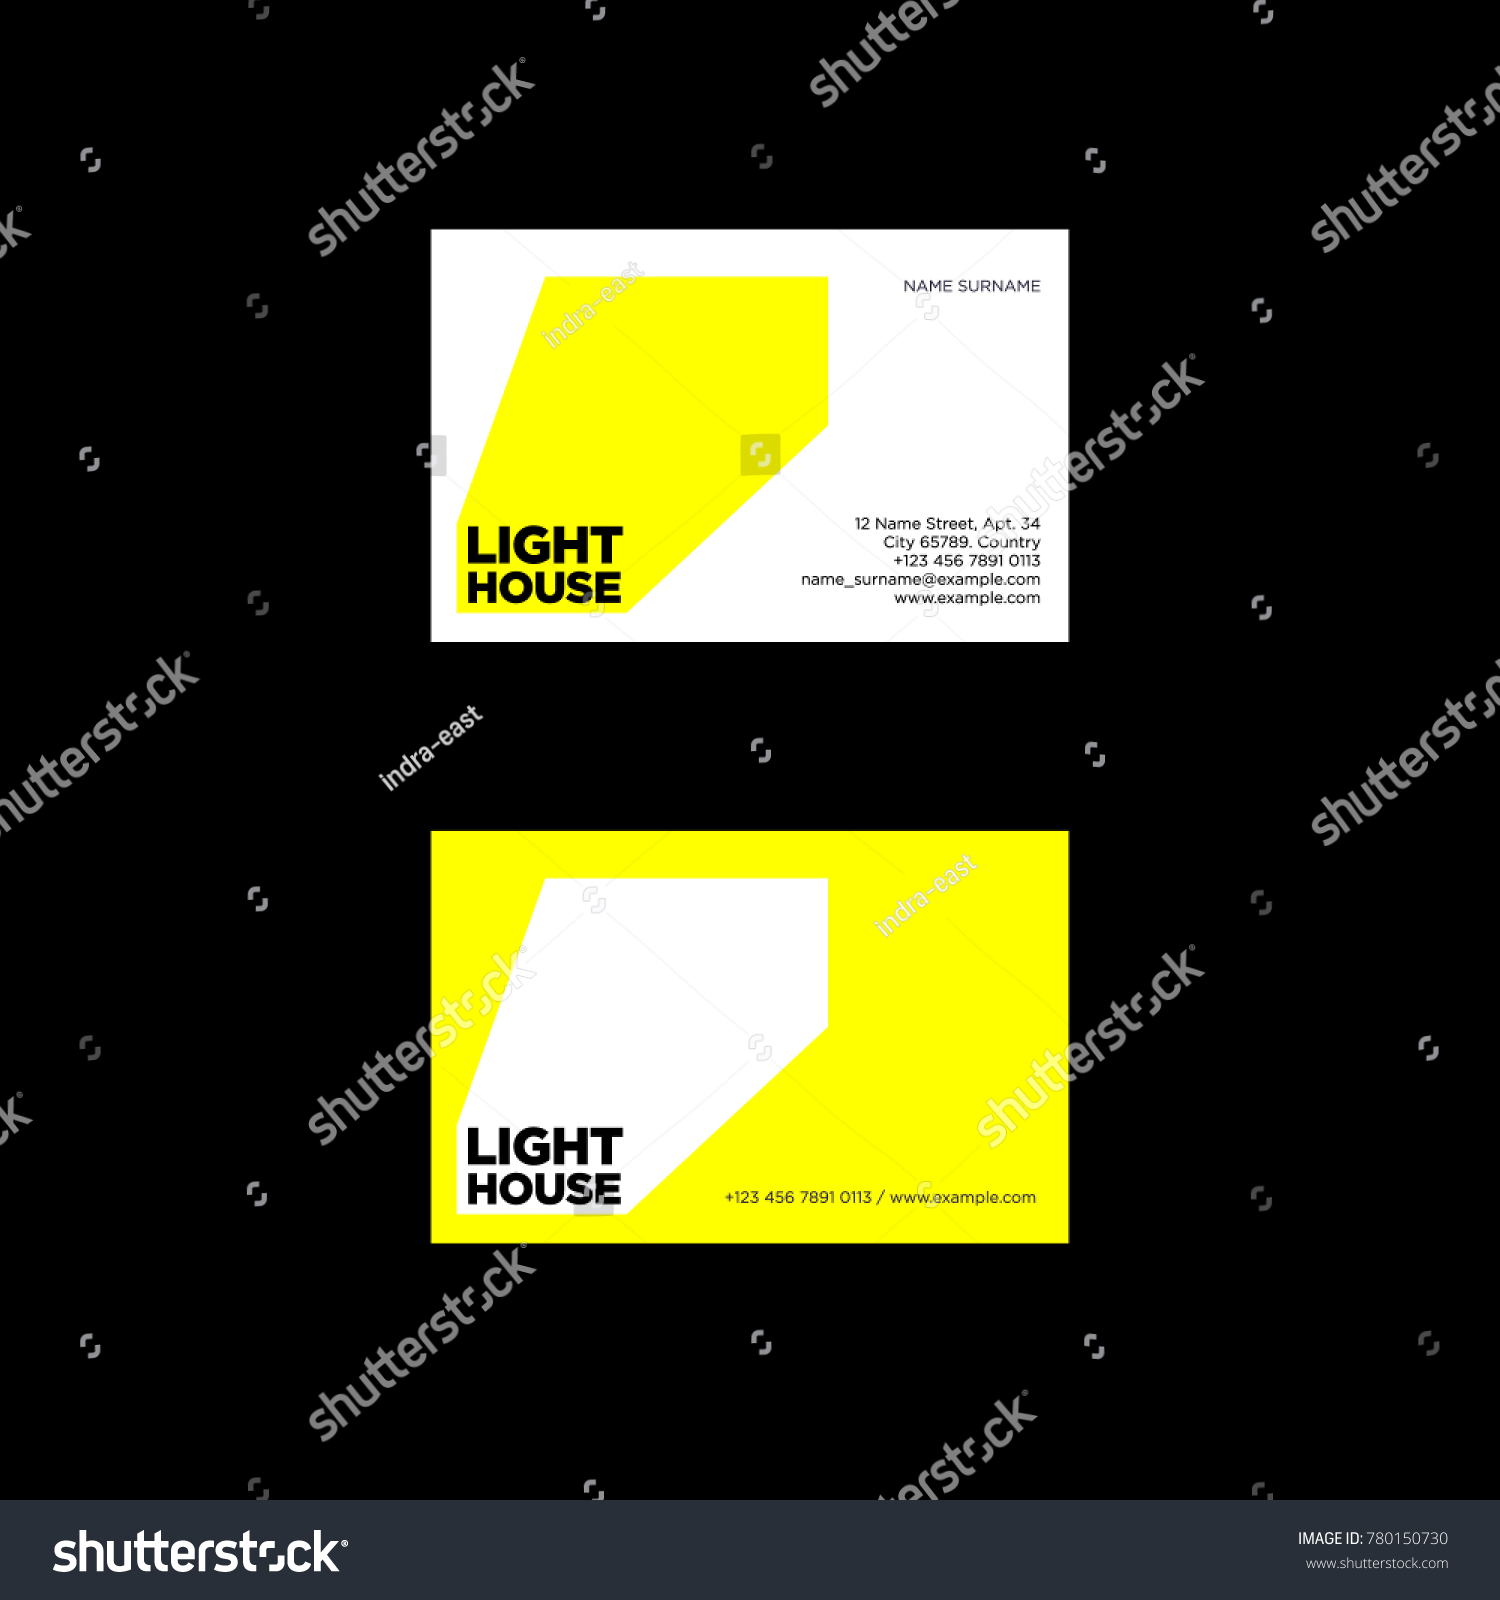 Lighthouse Logo Ray Light Emblem Identity Stock Vector 780150730 ...